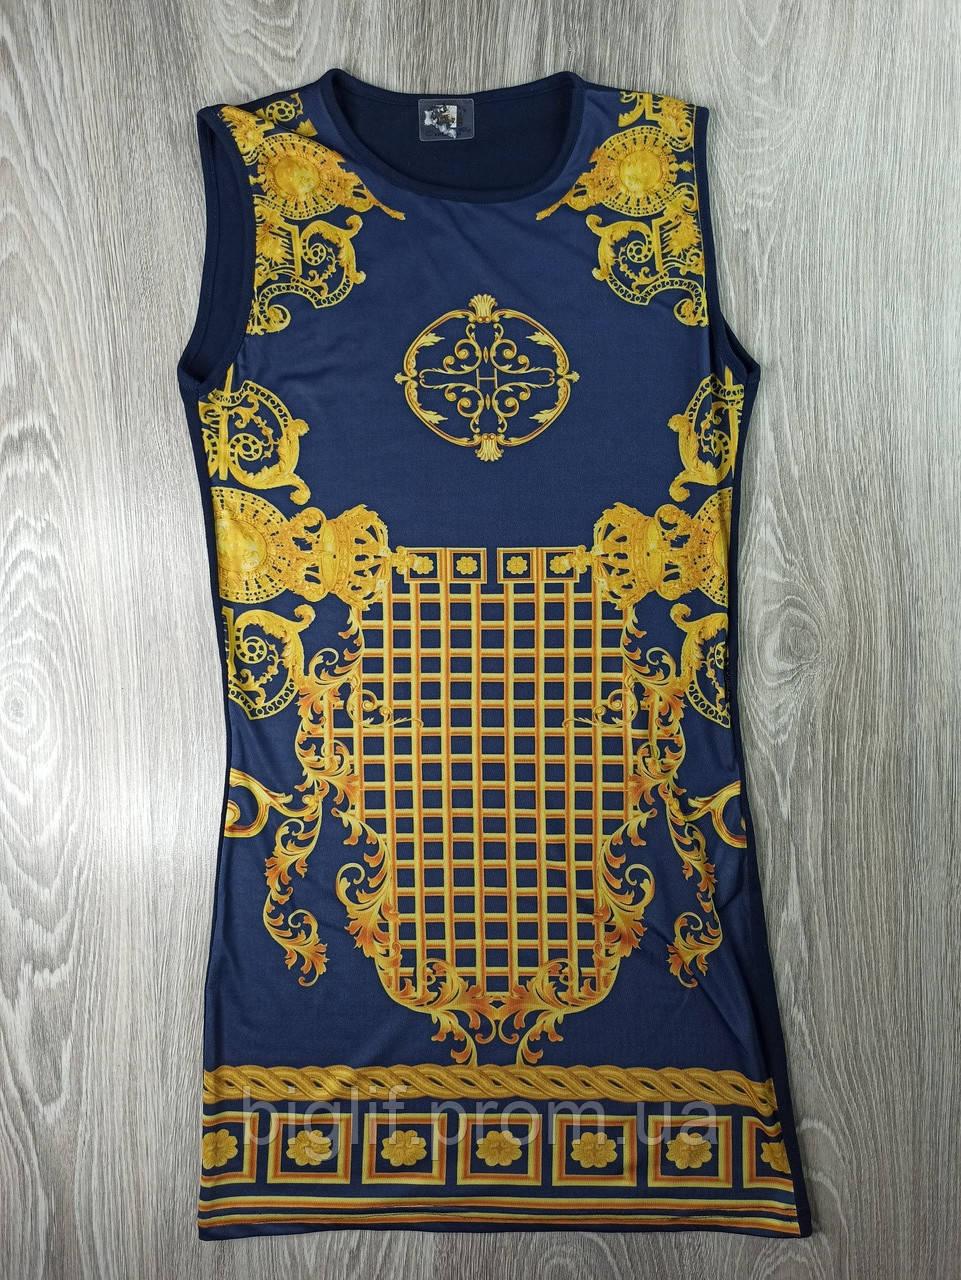 Туника (ночнушка) Teknur  М (42-44) синий с золотыми узорами (0-212)